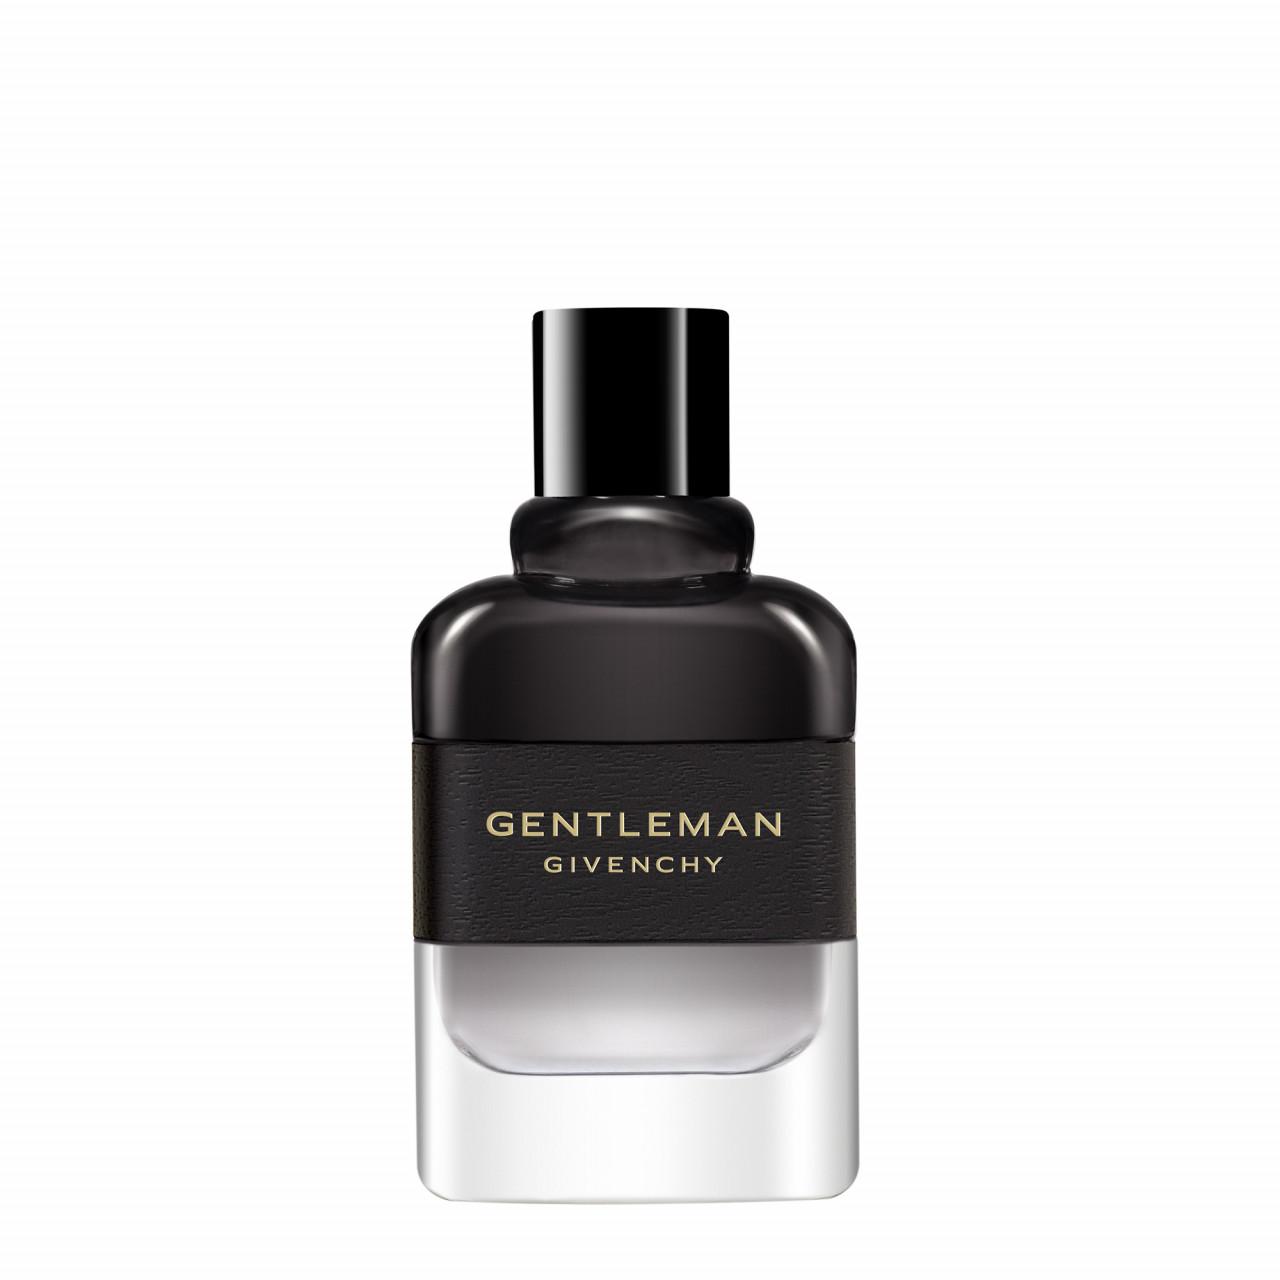 Givenchy Gentleman Boisée